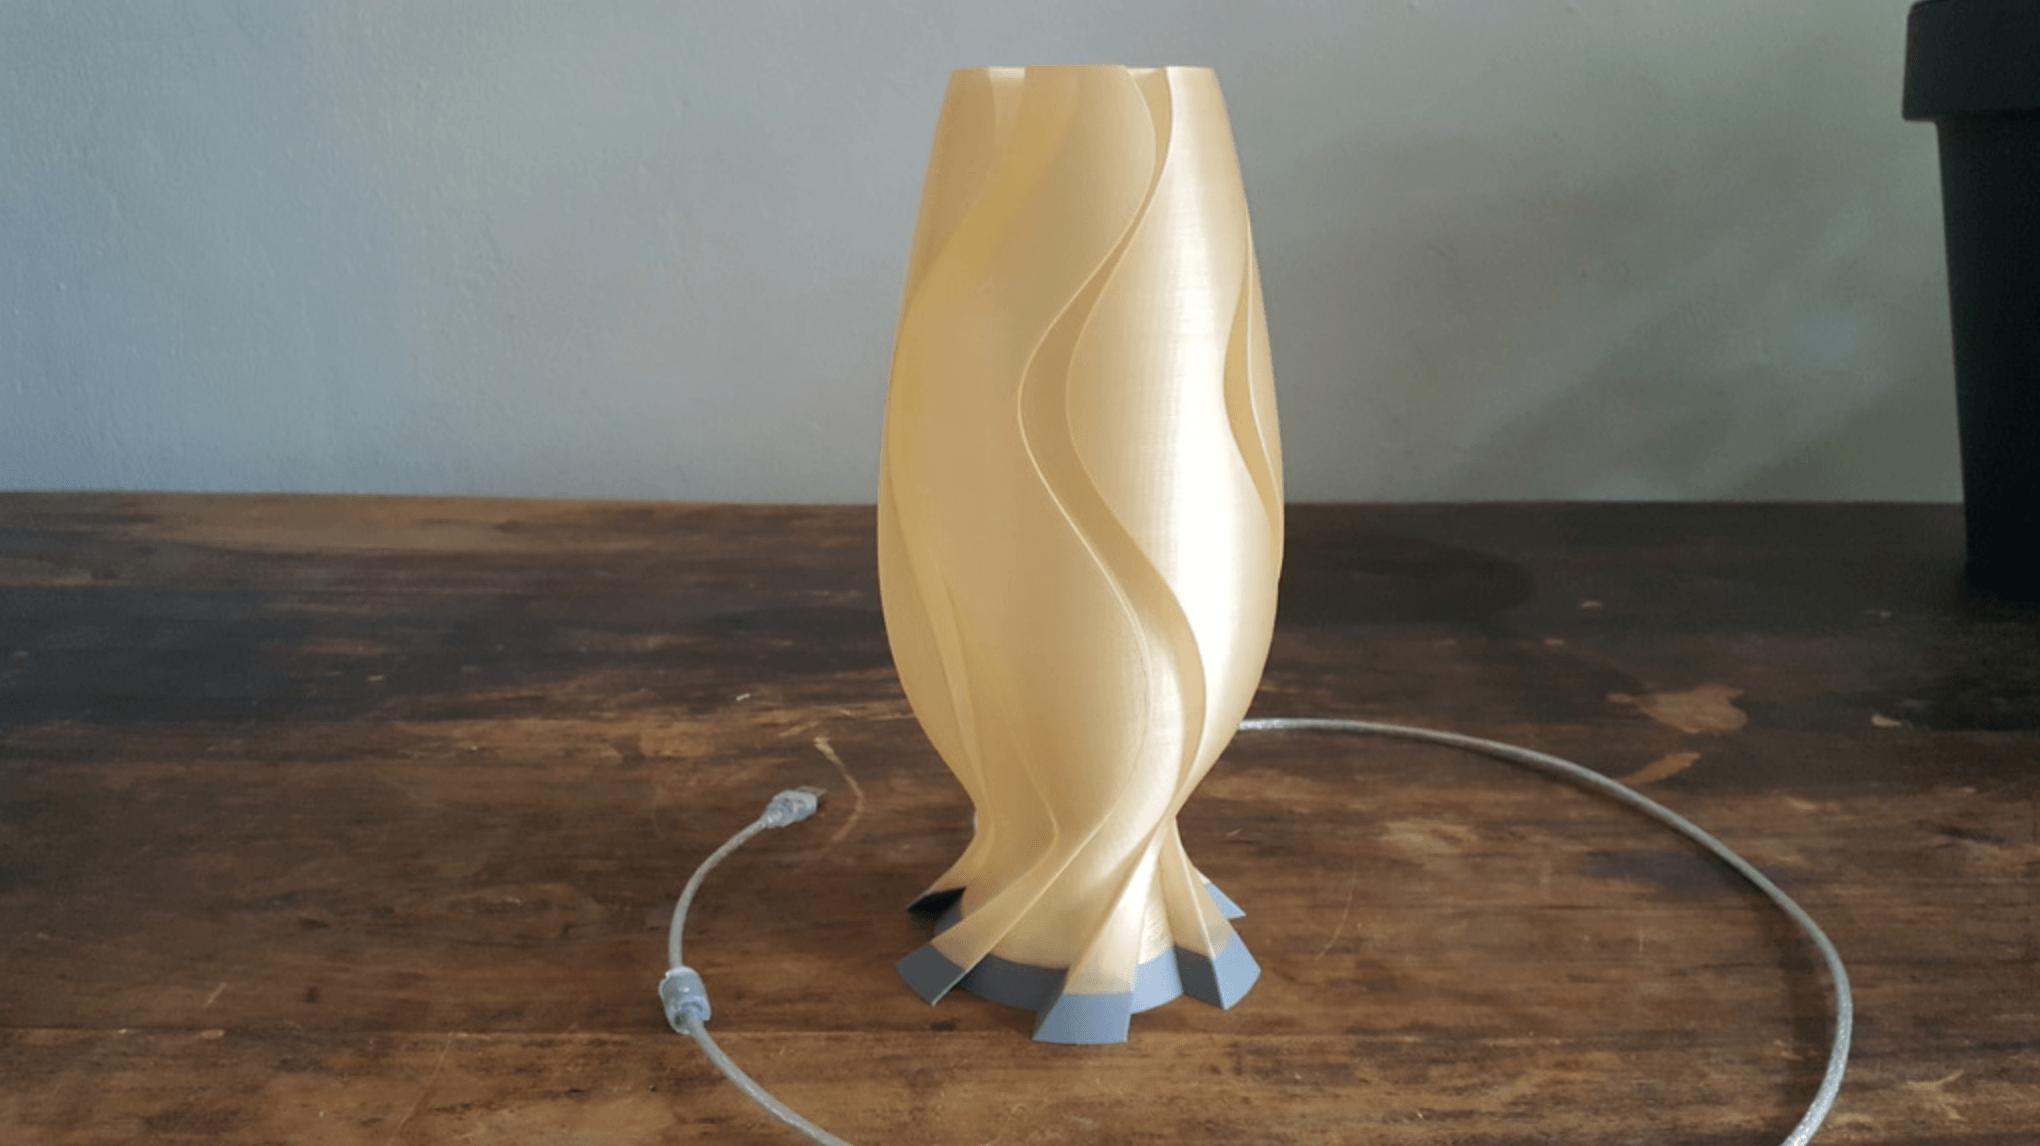 Capture d'écran 2018-05-21 à 15.49.47.png Download free STL file Golden Wave Lamp • 3D printing model, Job